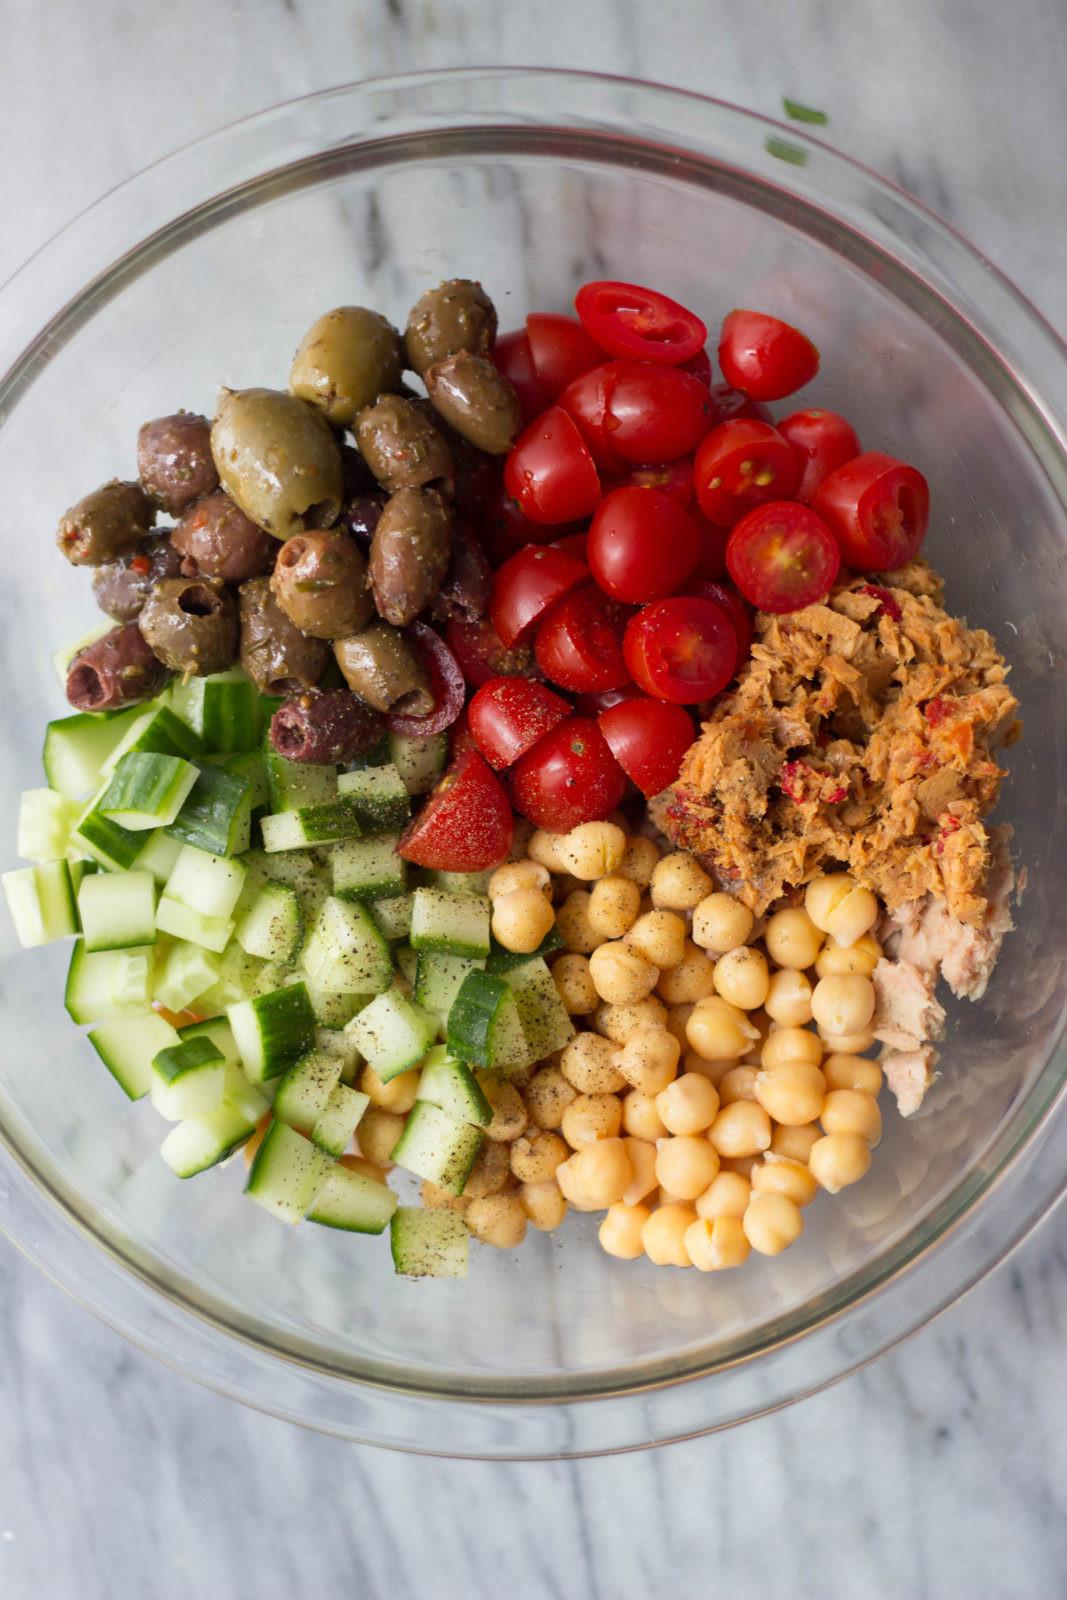 Vegetarian Tuna Recipes  Mediterranean Chickpea & Tuna Salad The Gourmet RD